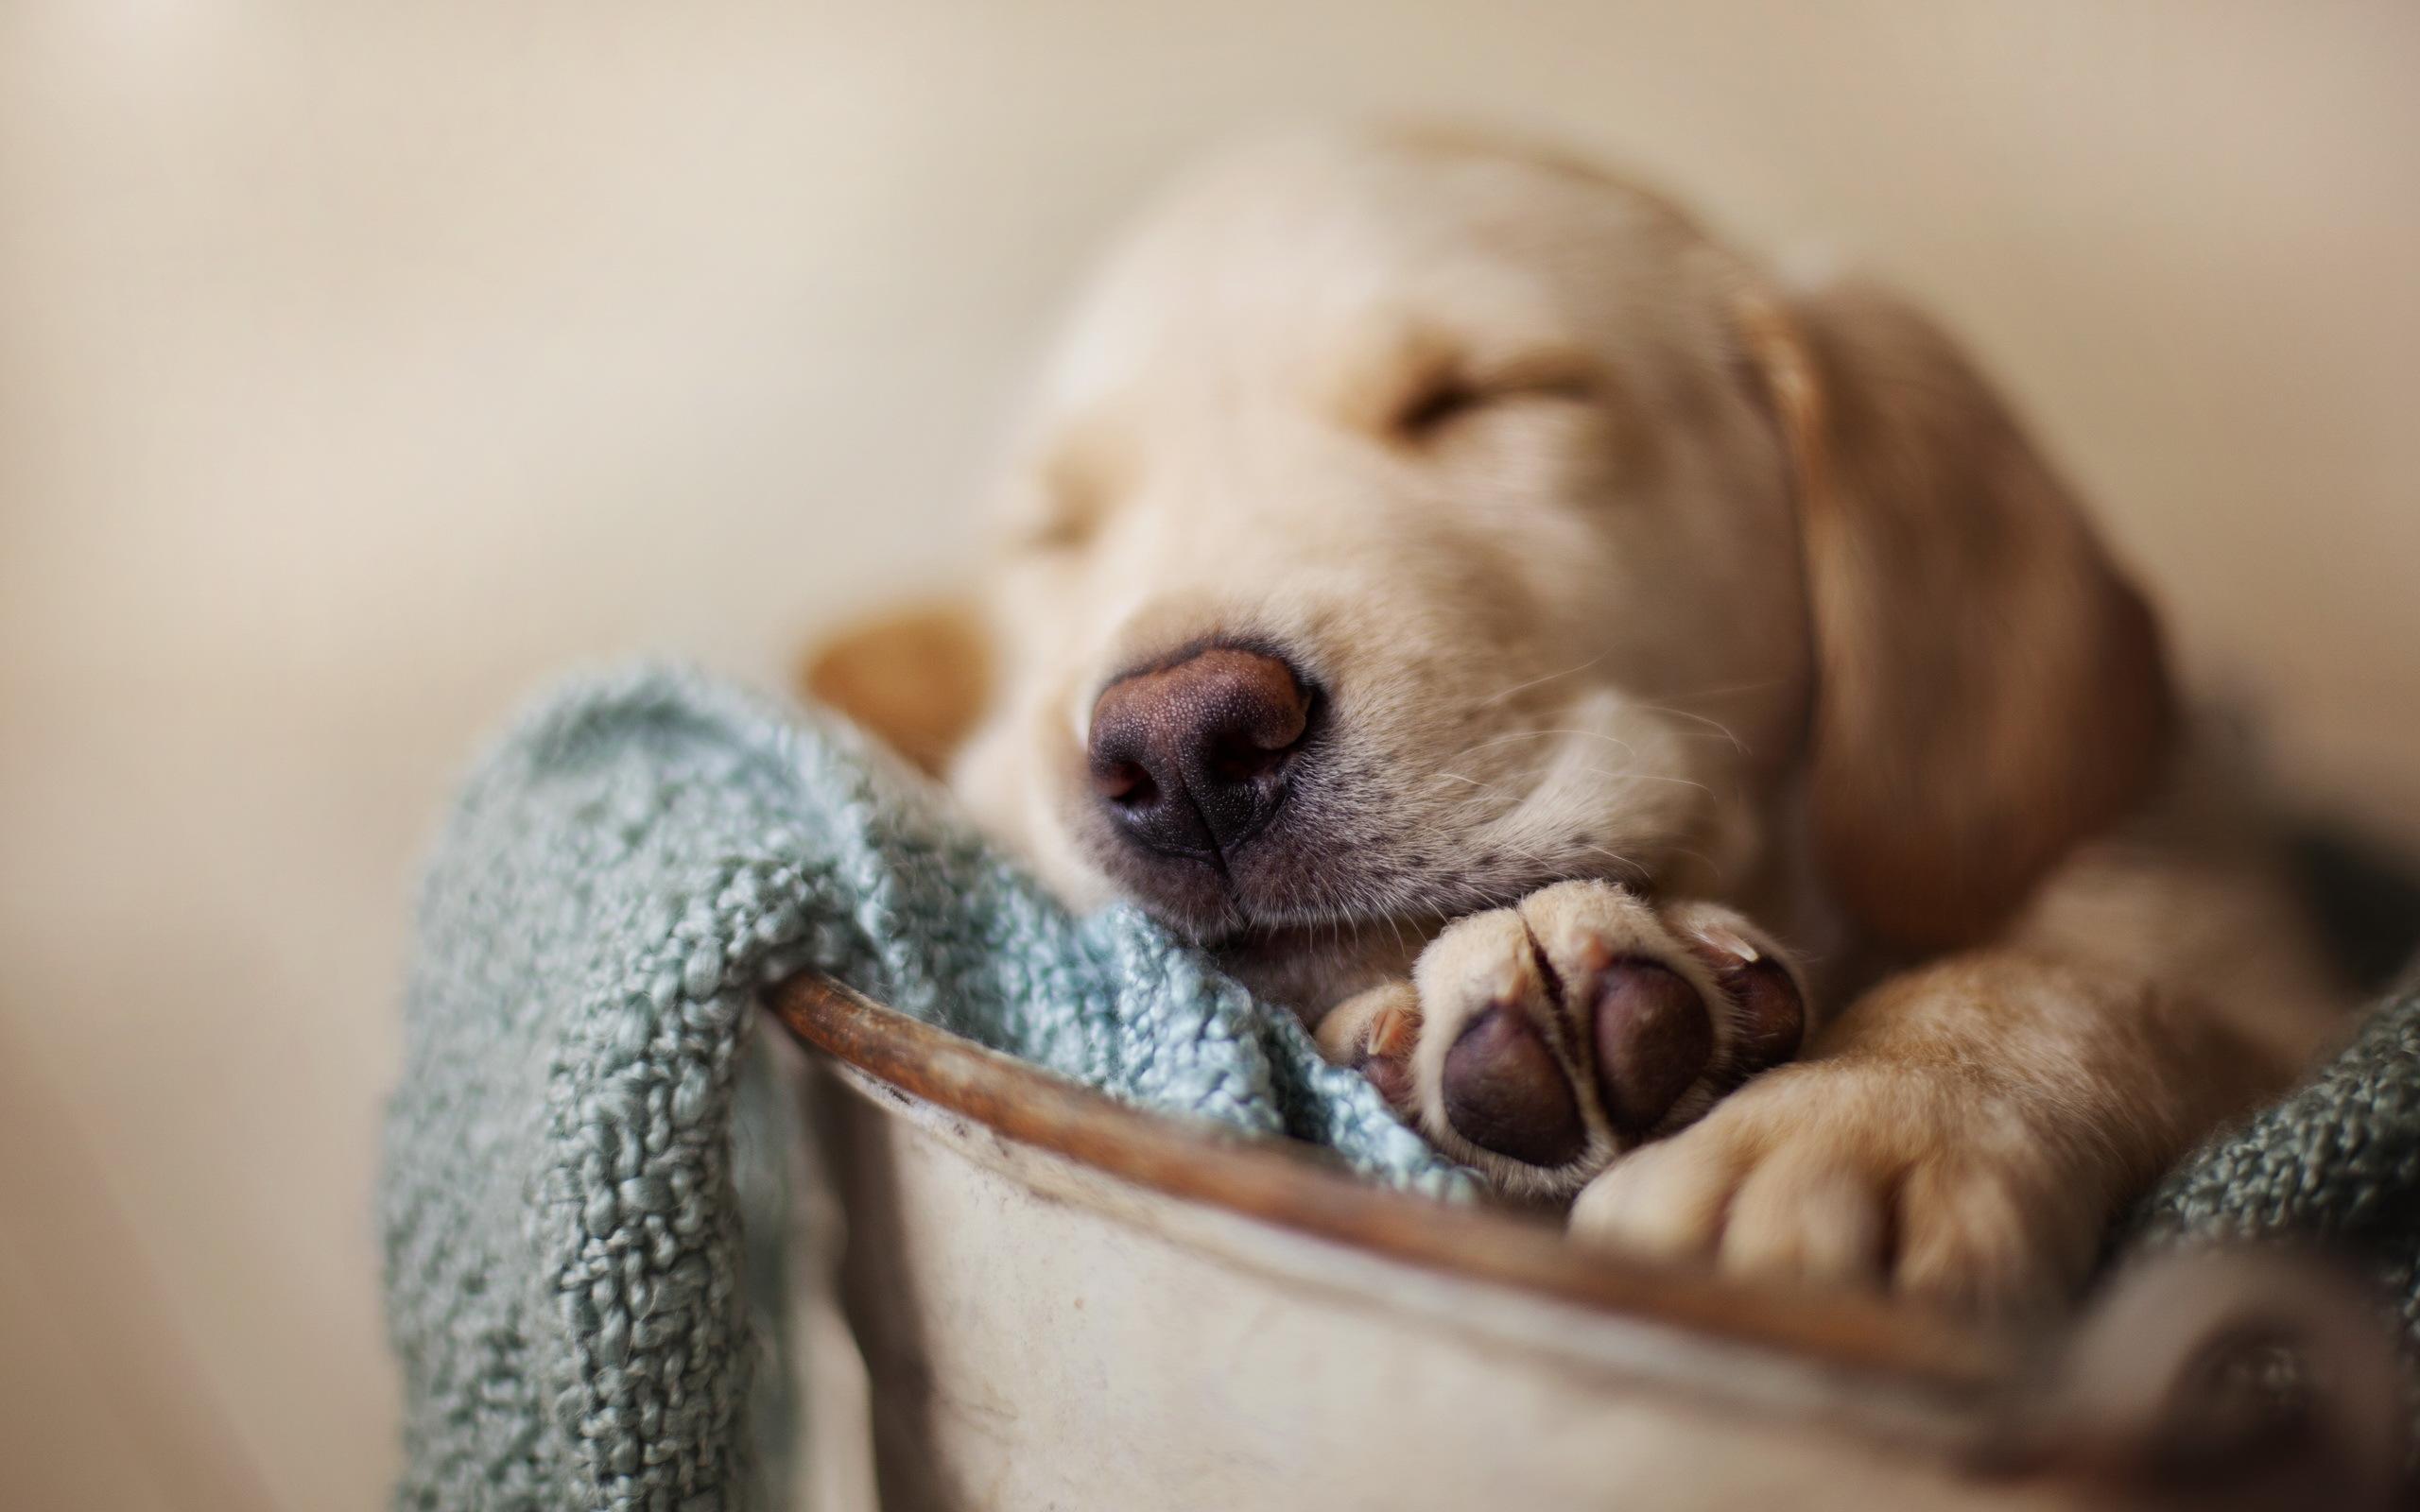 sleepy animals pictures - HD1600×900